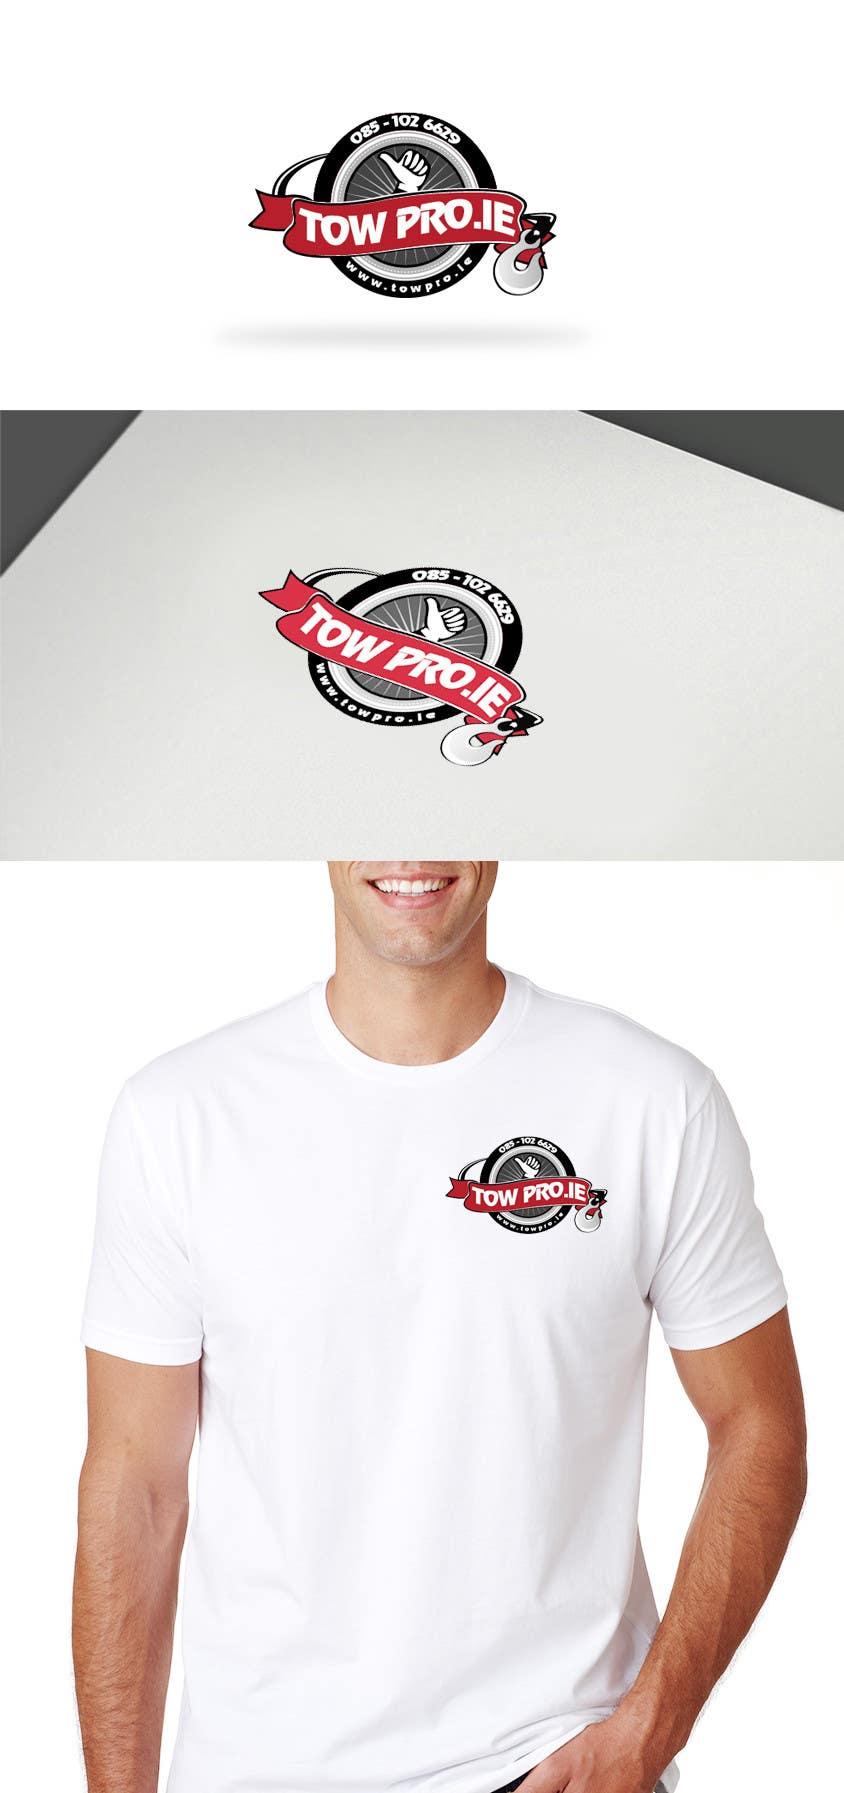 Penyertaan Peraduan #43 untuk Design a Logo for Towing company